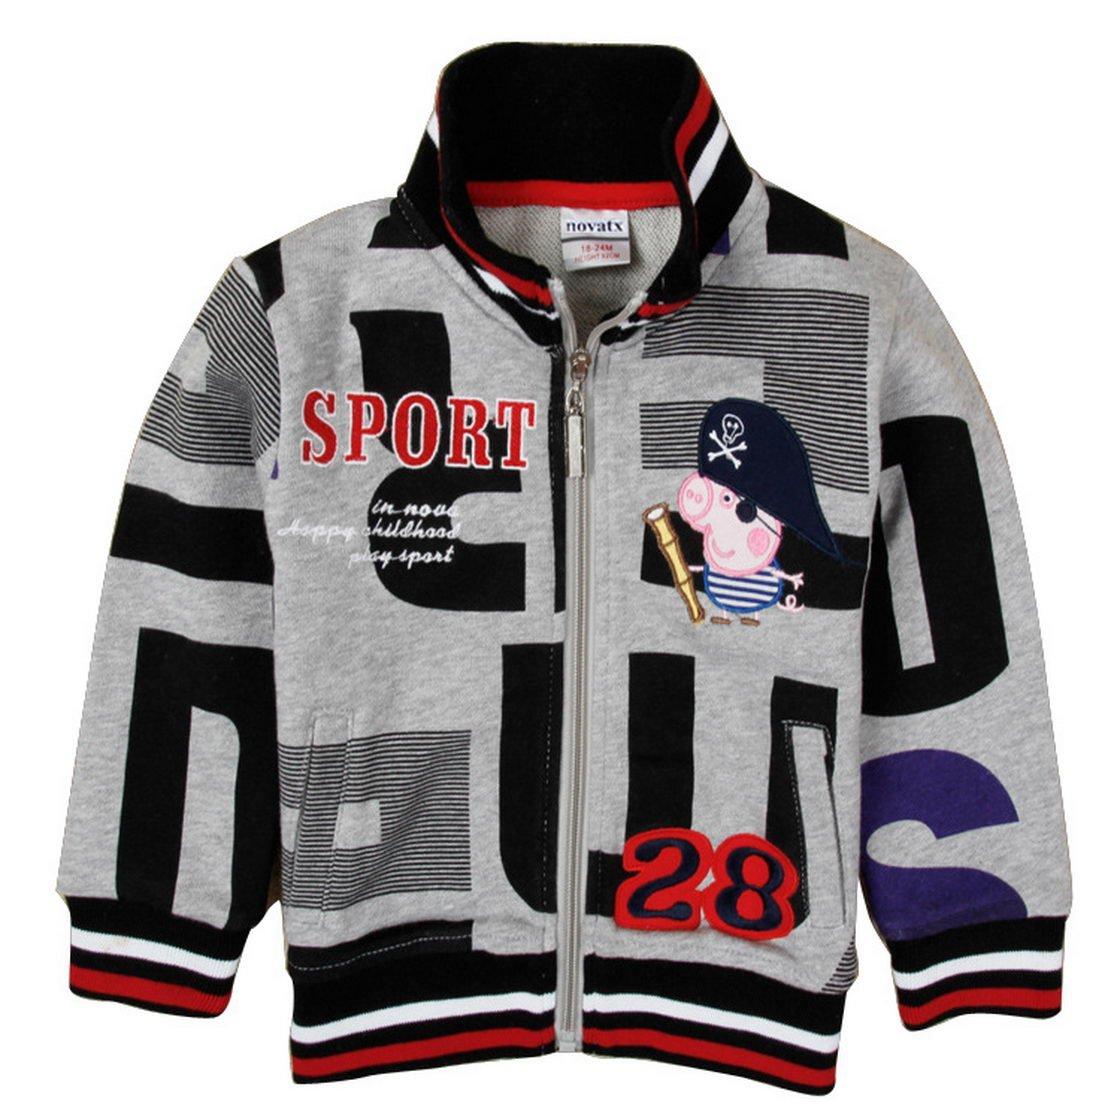 Peppa Pig Little Boys Long Sleeve Cartoon Embroidery Fleece Sweatshirt Jacket Gray 4 (3/4Y) Tiful